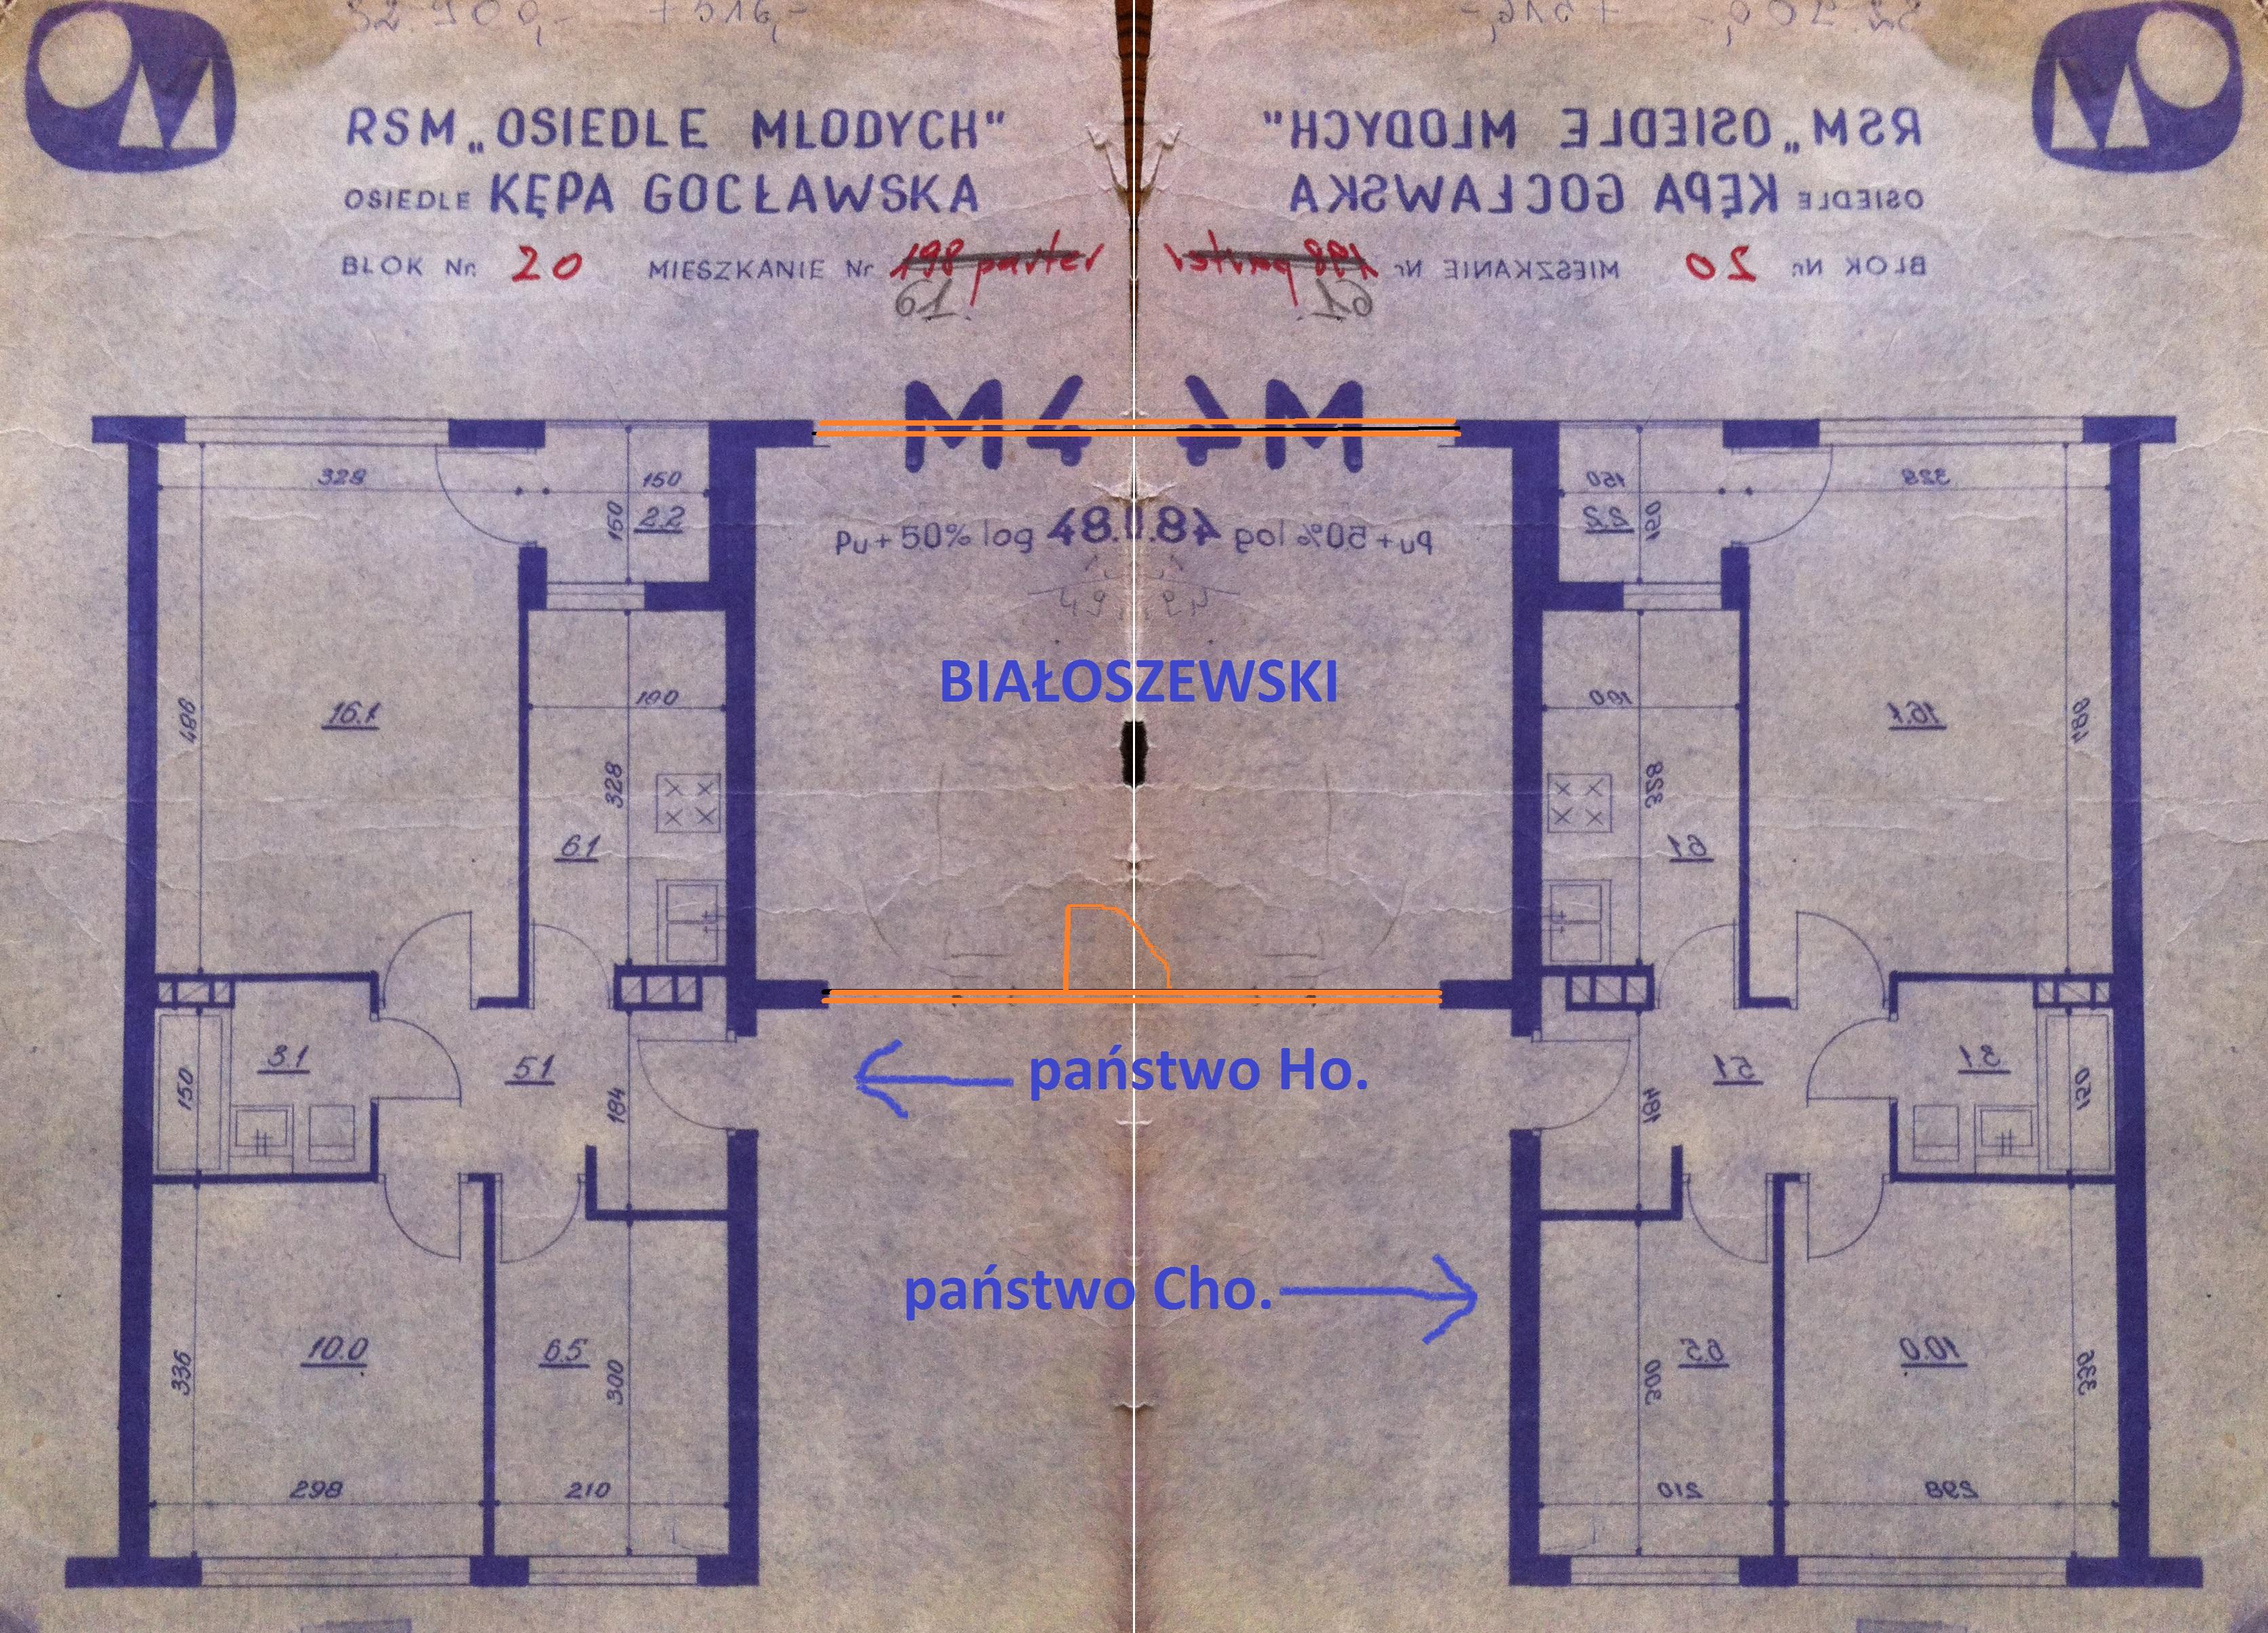 państwo Ho. plan mieszkania